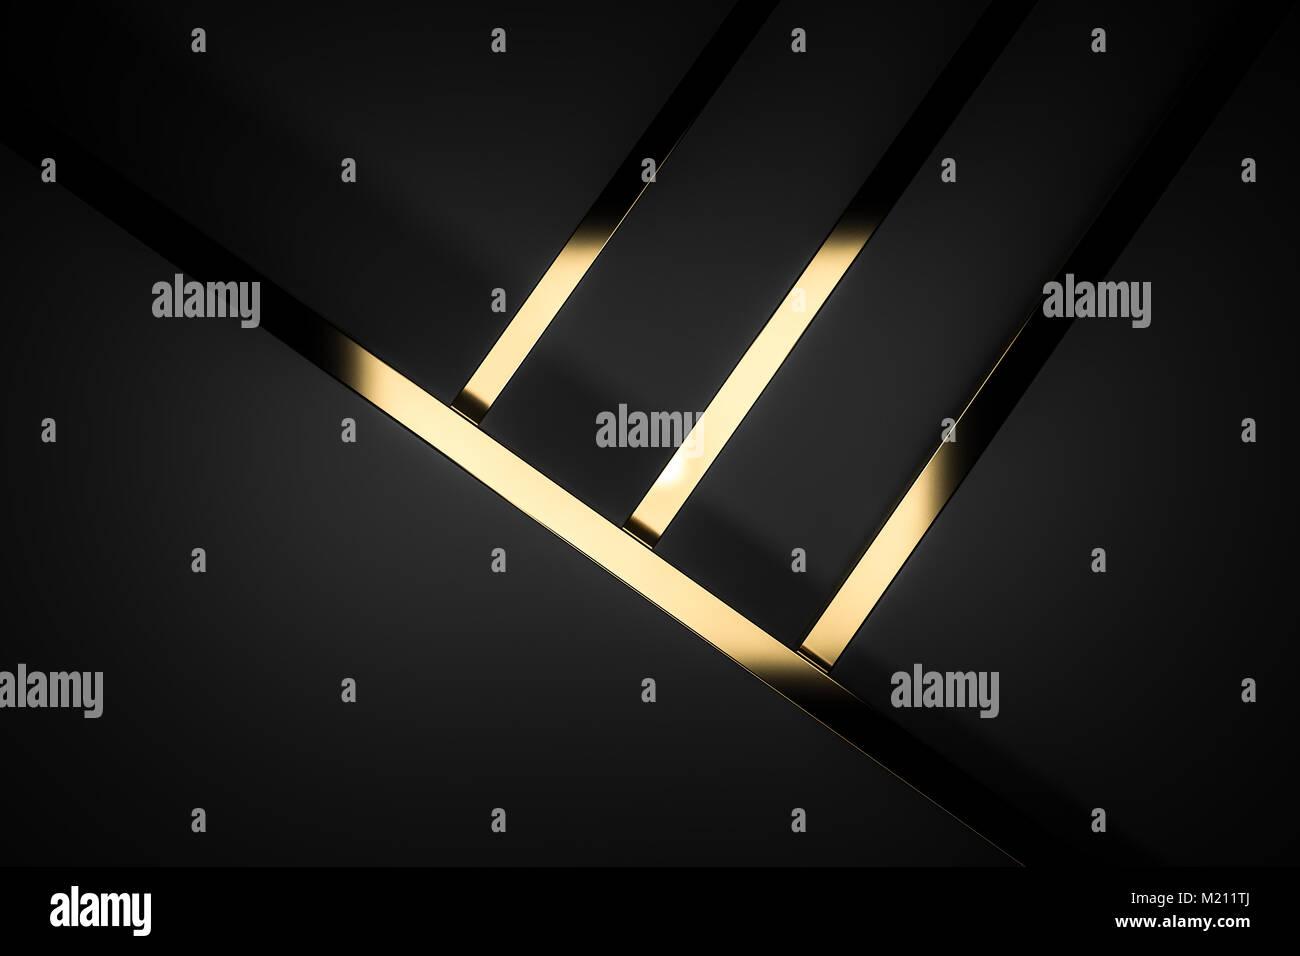 Abstract Dark Black Gold Luxury Background 3d Render Stock